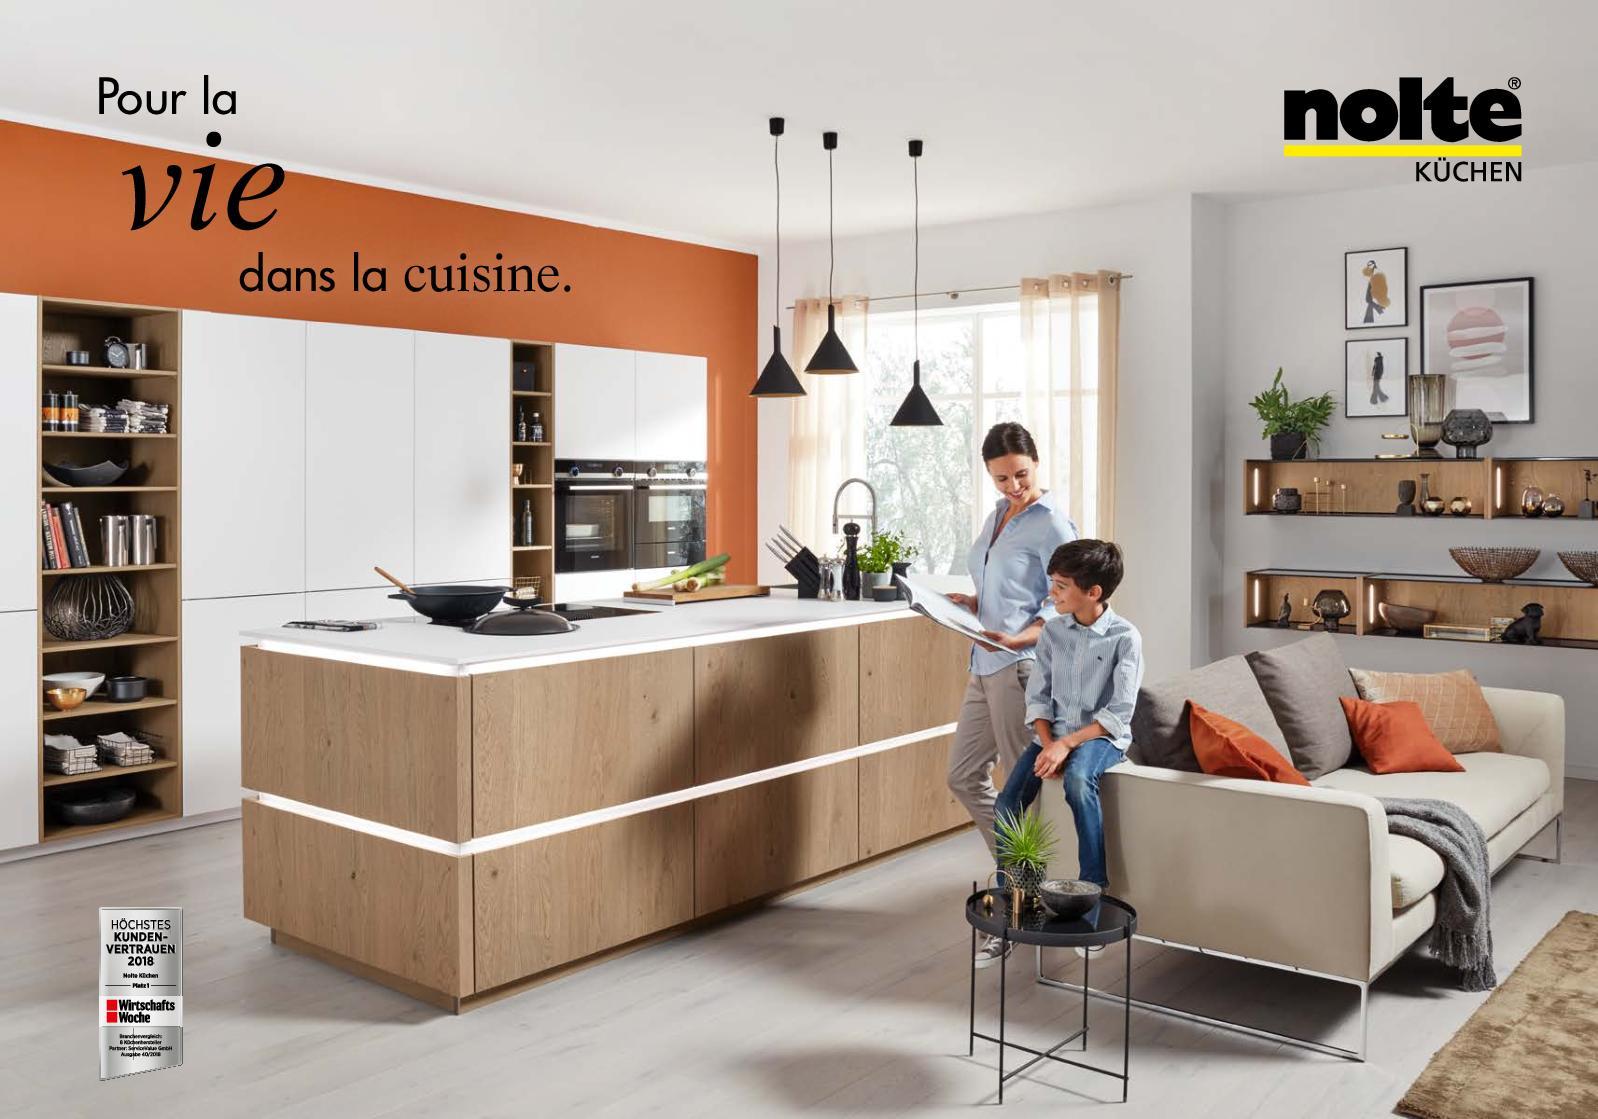 Nettoyer Meuble Cuisine Mat calaméo - cuisine nolte 2019